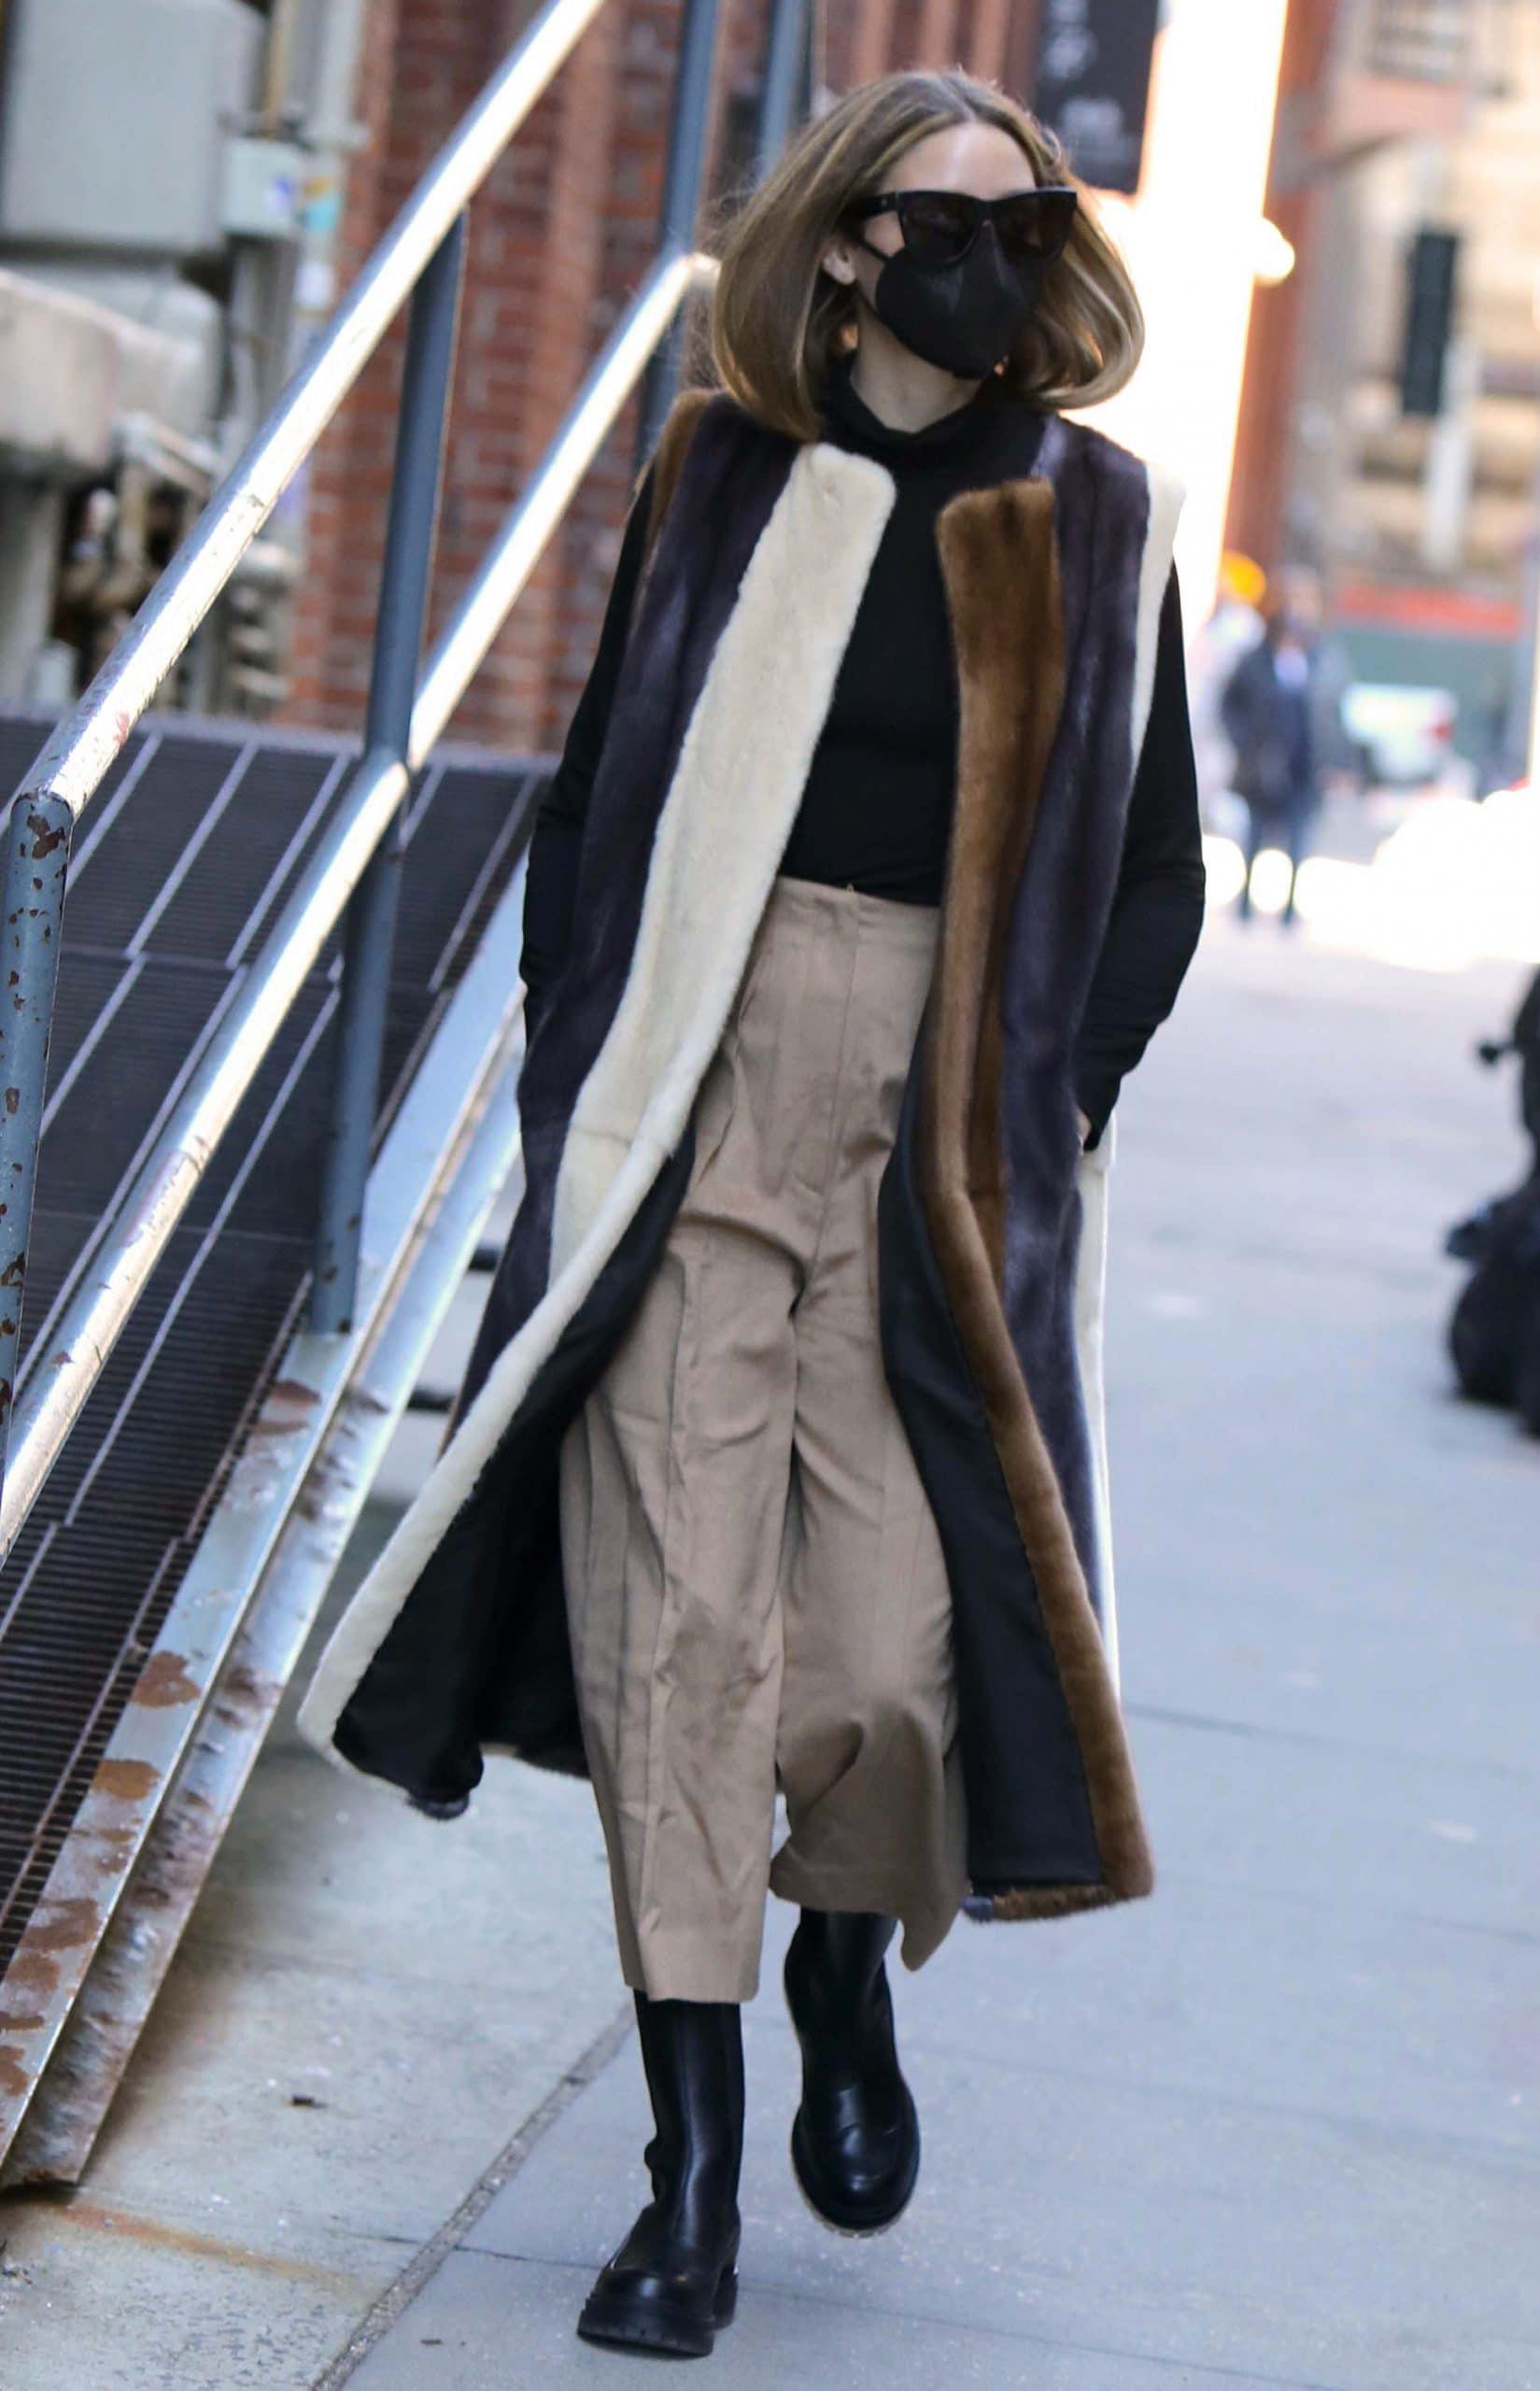 Olivia Palermo in a winter chic Pologeorgis faux fur striped vest, black turtleneck sweater, and khaki pants